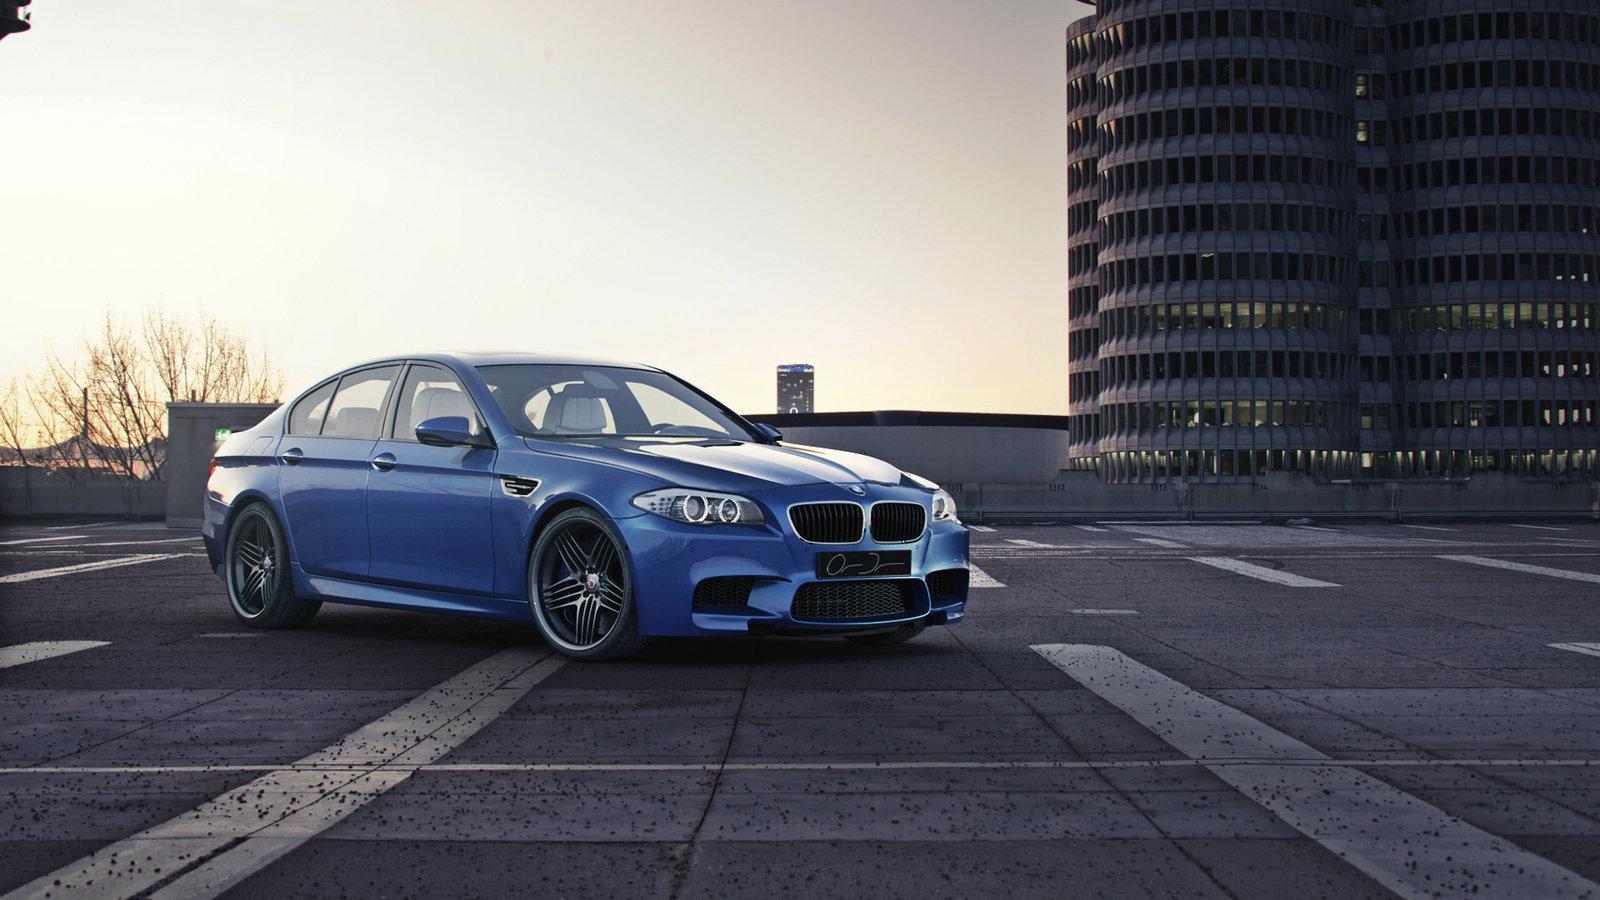 BMW-M-Alpina-Dynamic-by-DuronDesign-deviantart-com-on-deviantART-wallpaper-wp5204745